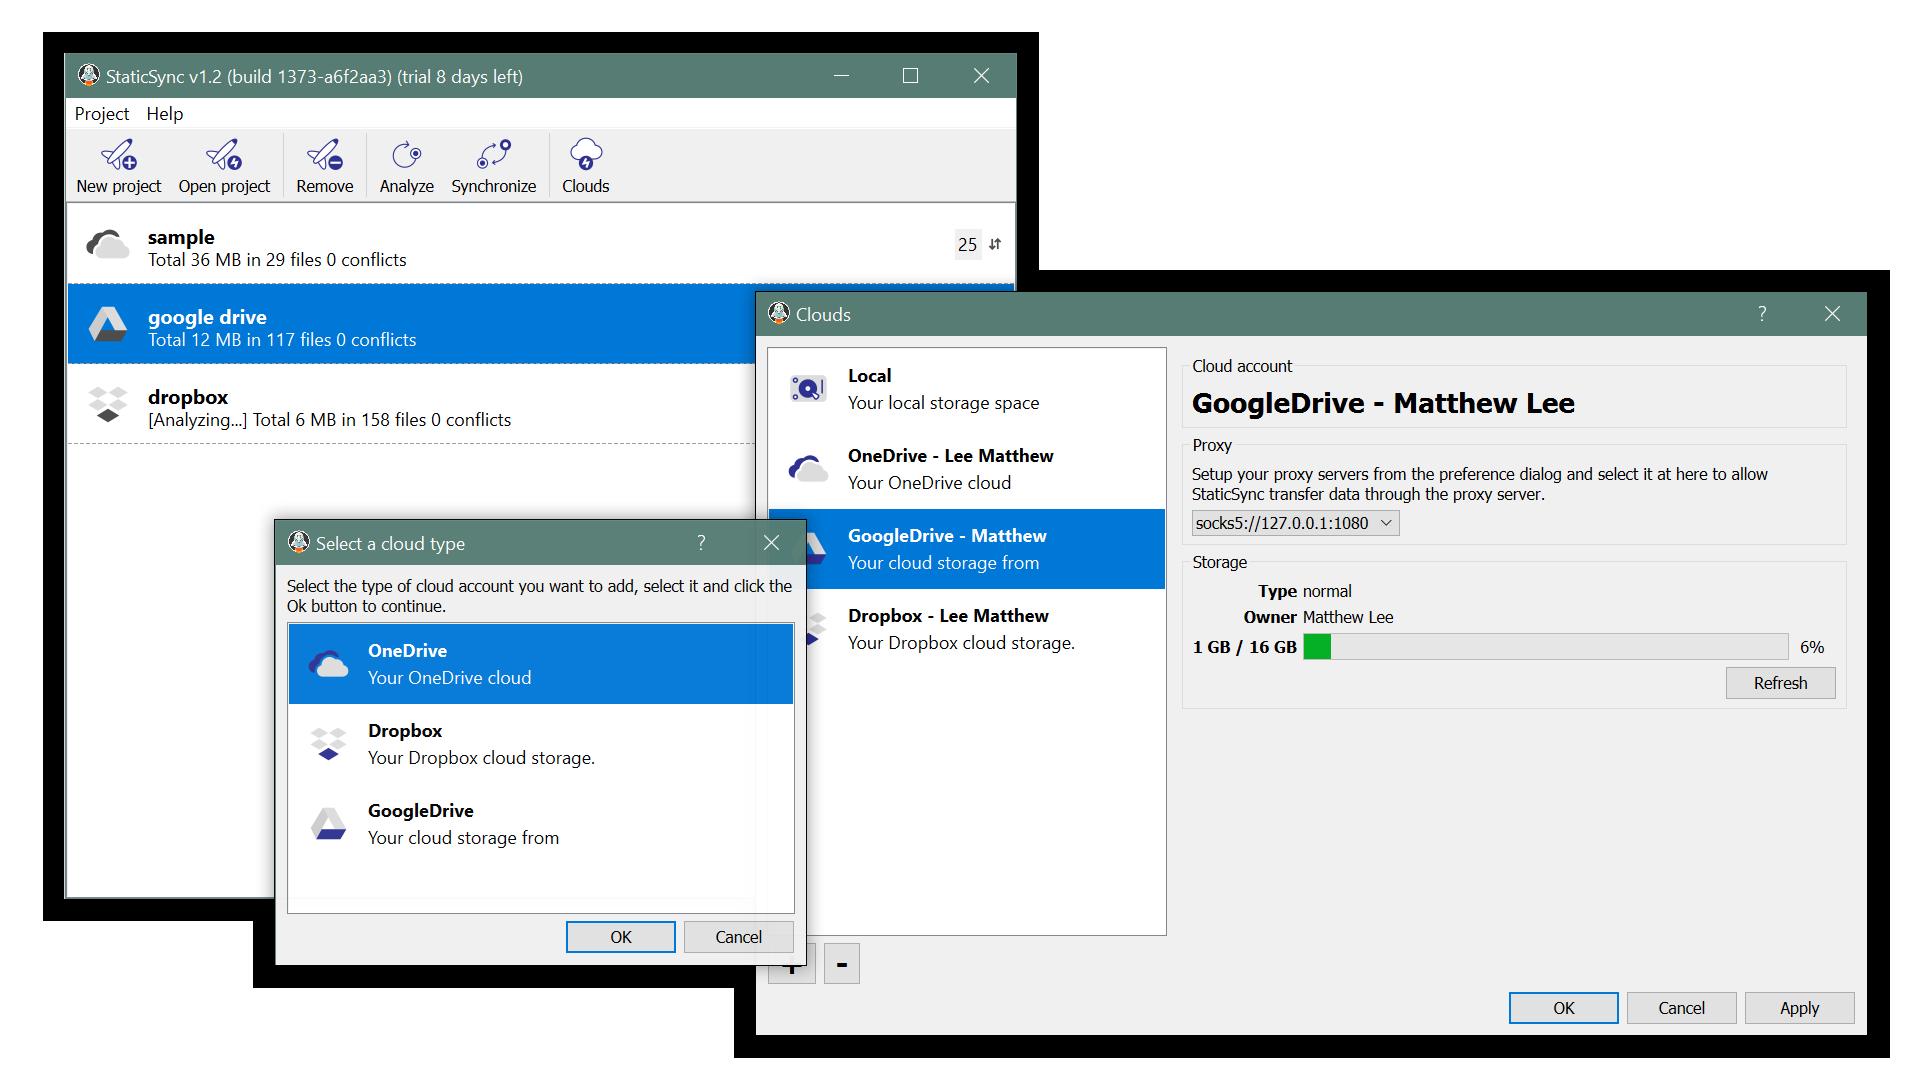 StaticSync, Security Software Screenshot